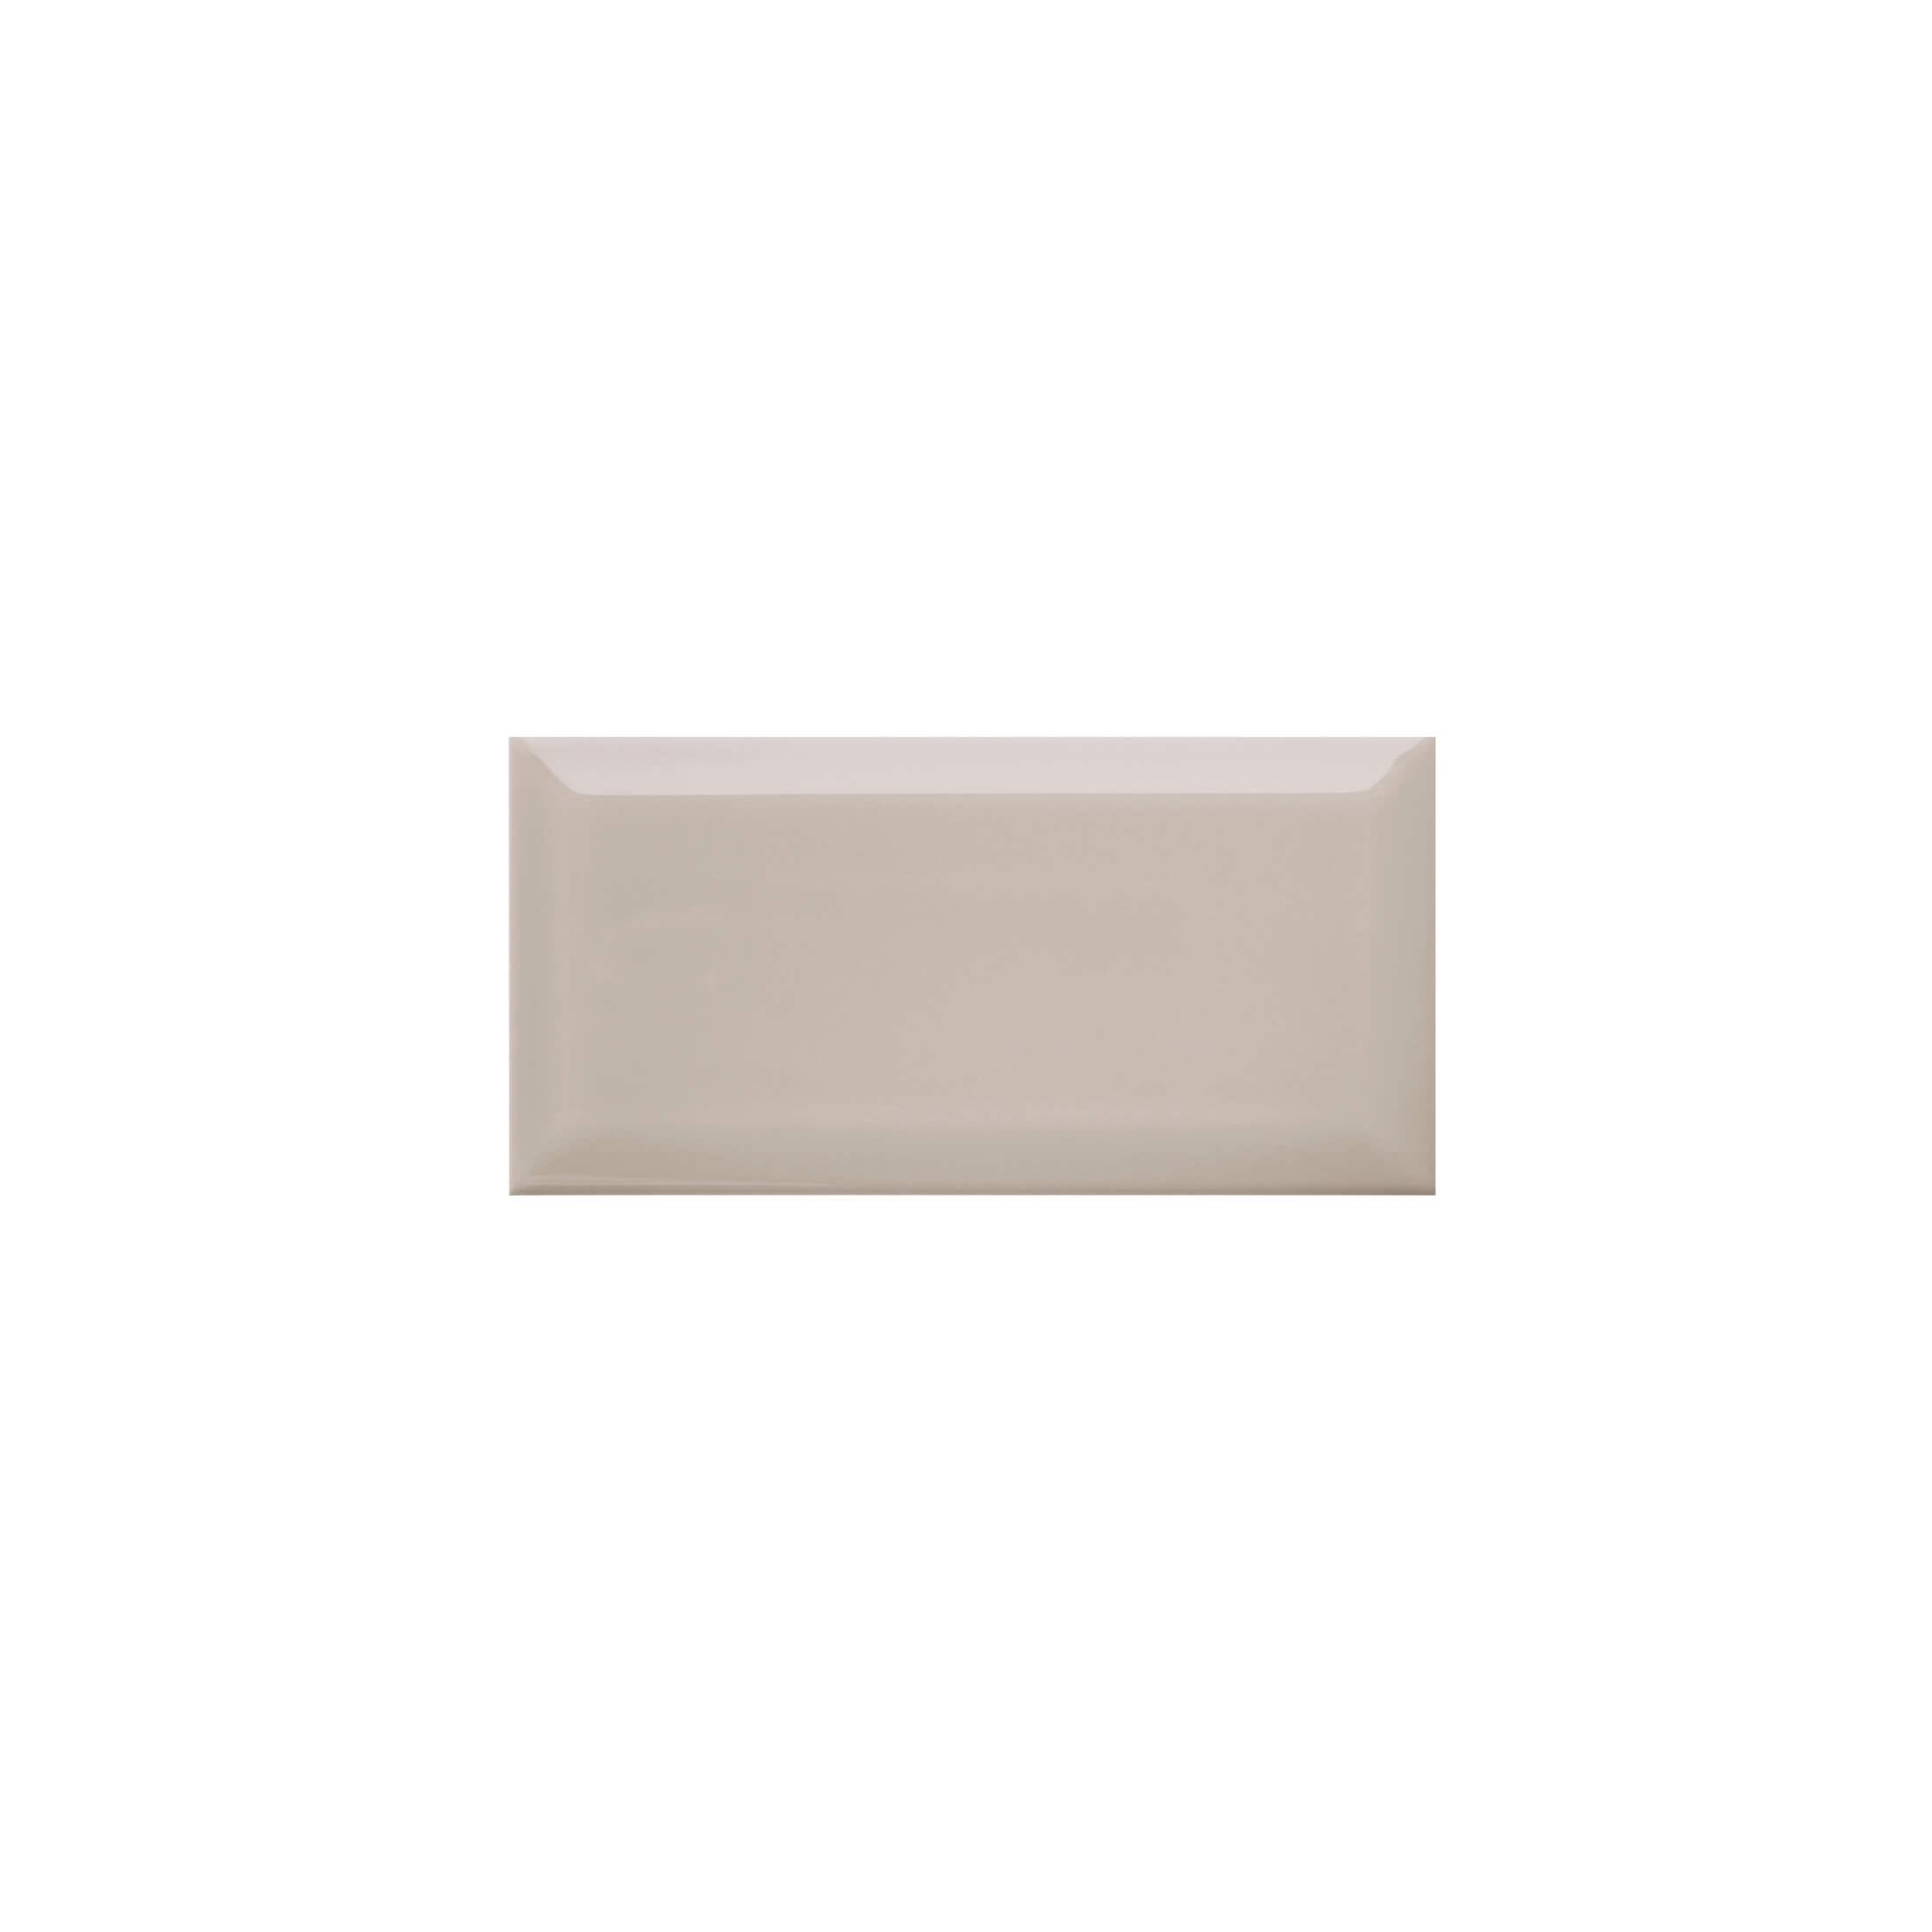 ADNE2049 - BISELADO PB - 7.5 cm X 15 cm